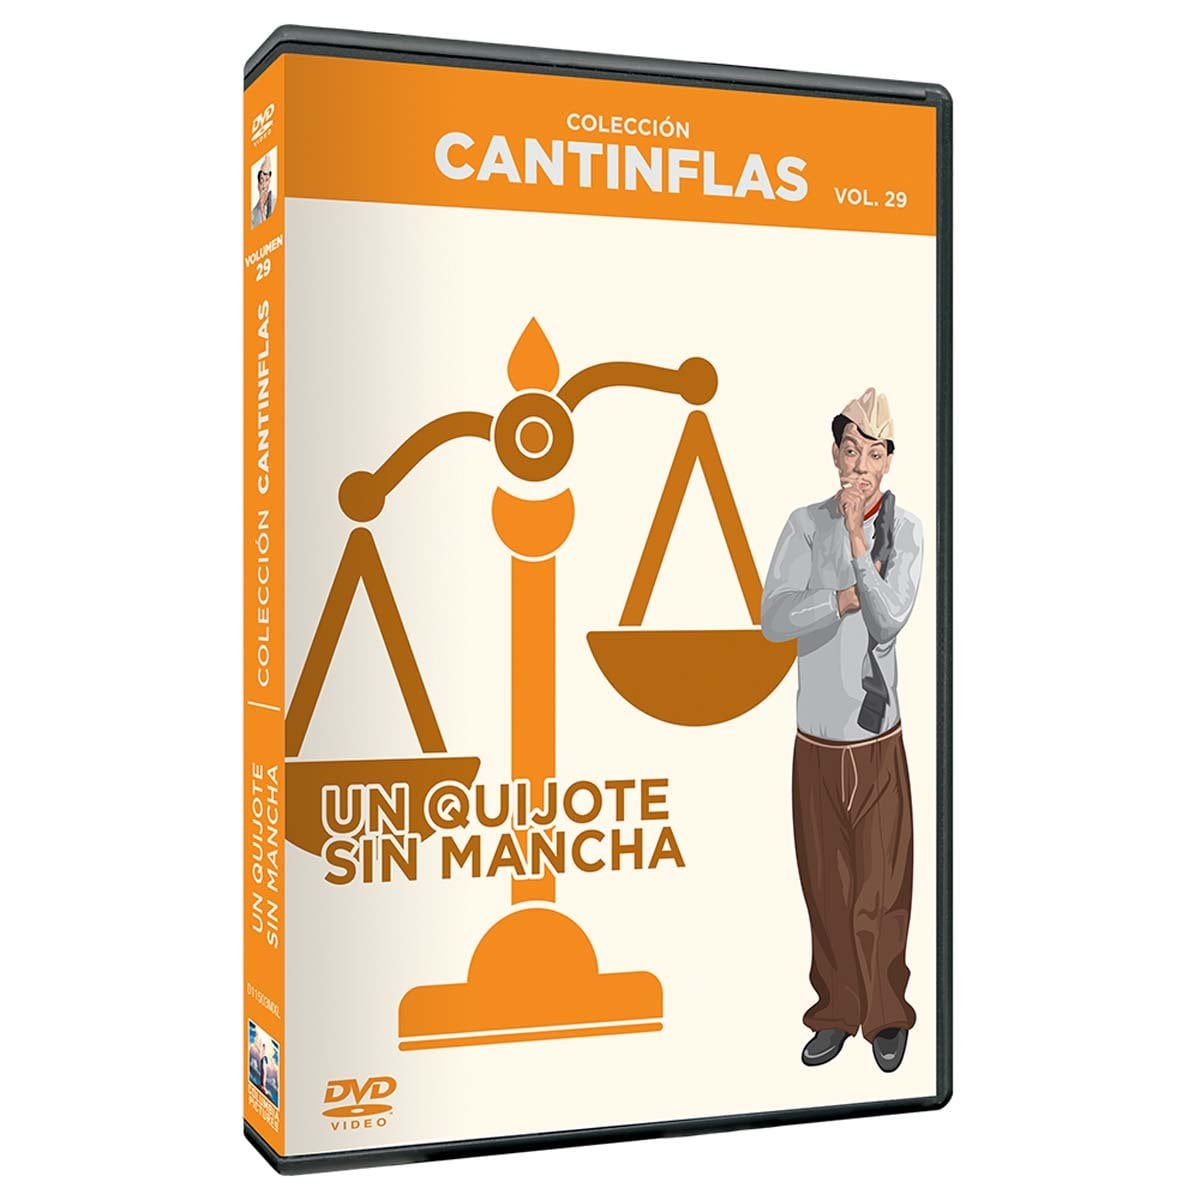 Dvd Coleccion Cantinflas un Quijote Sin Mancha